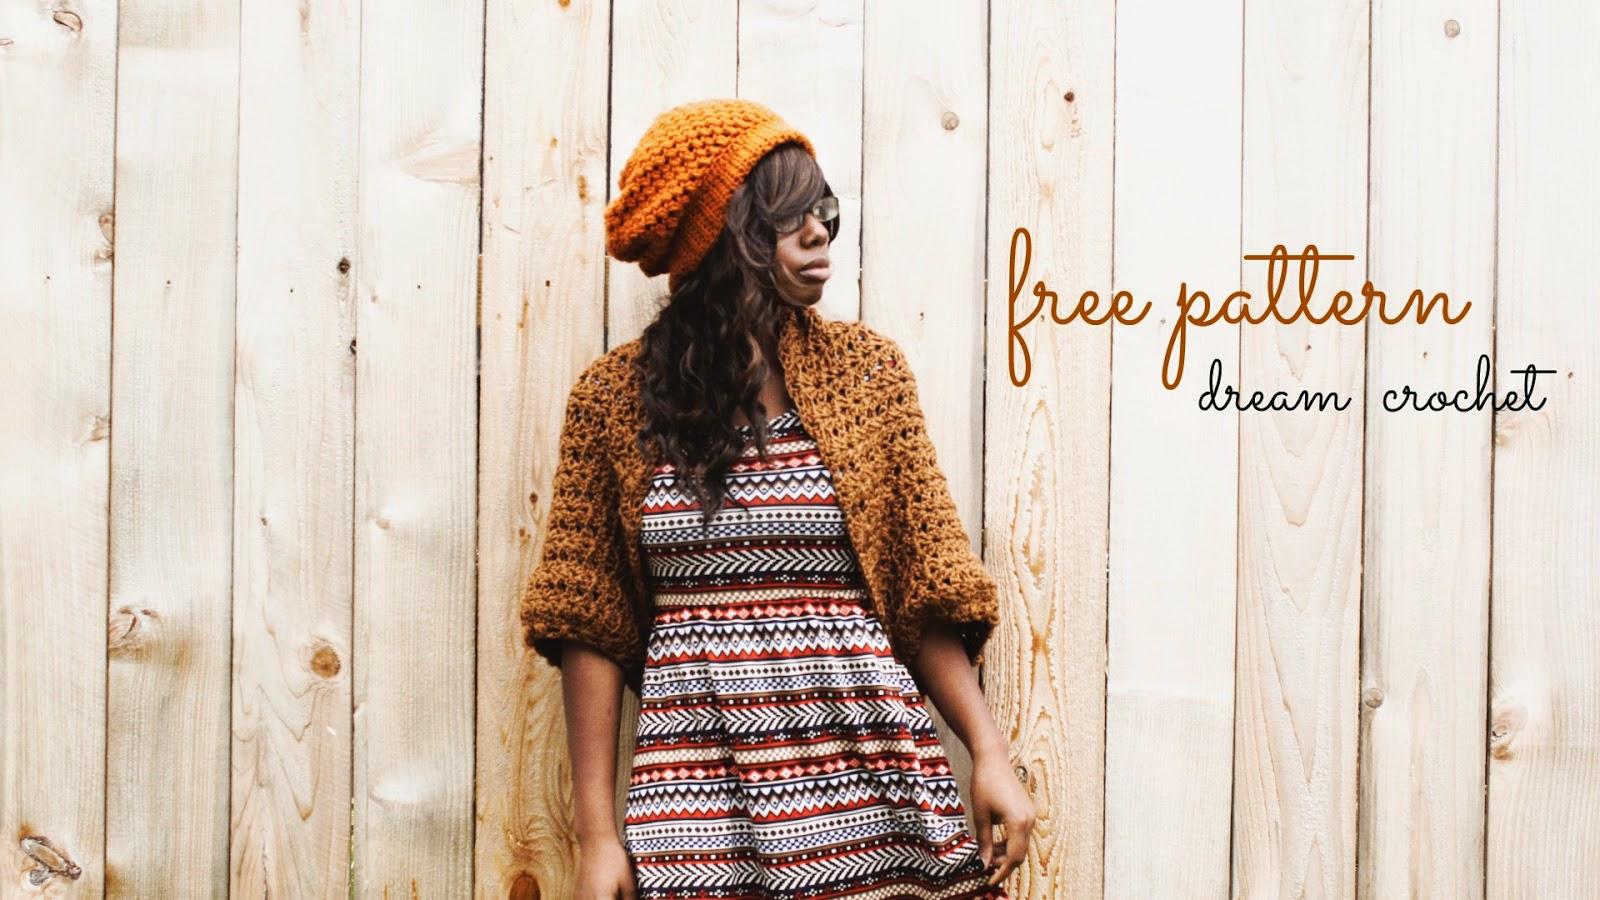 The dream crochet blog diy free pattern the everyday crochet diy free pattern the everyday crochet shrug pattern bankloansurffo Gallery